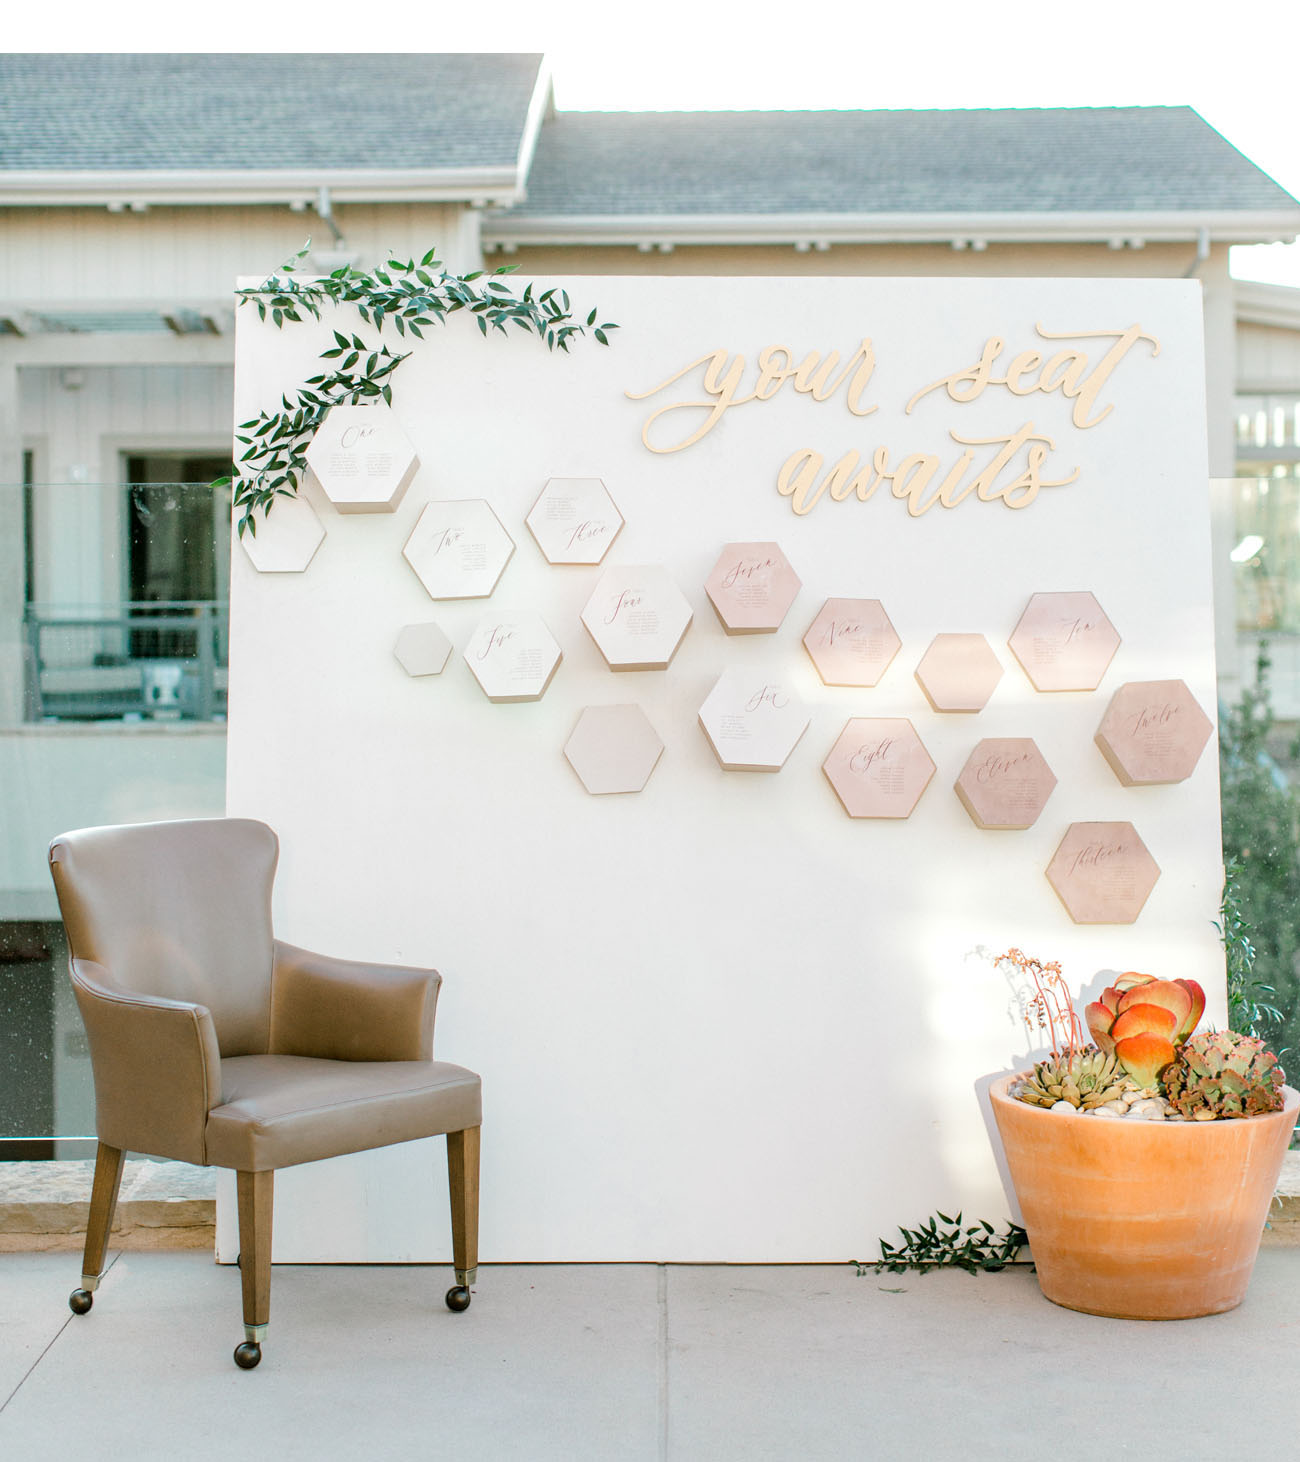 honeycomb seating chart